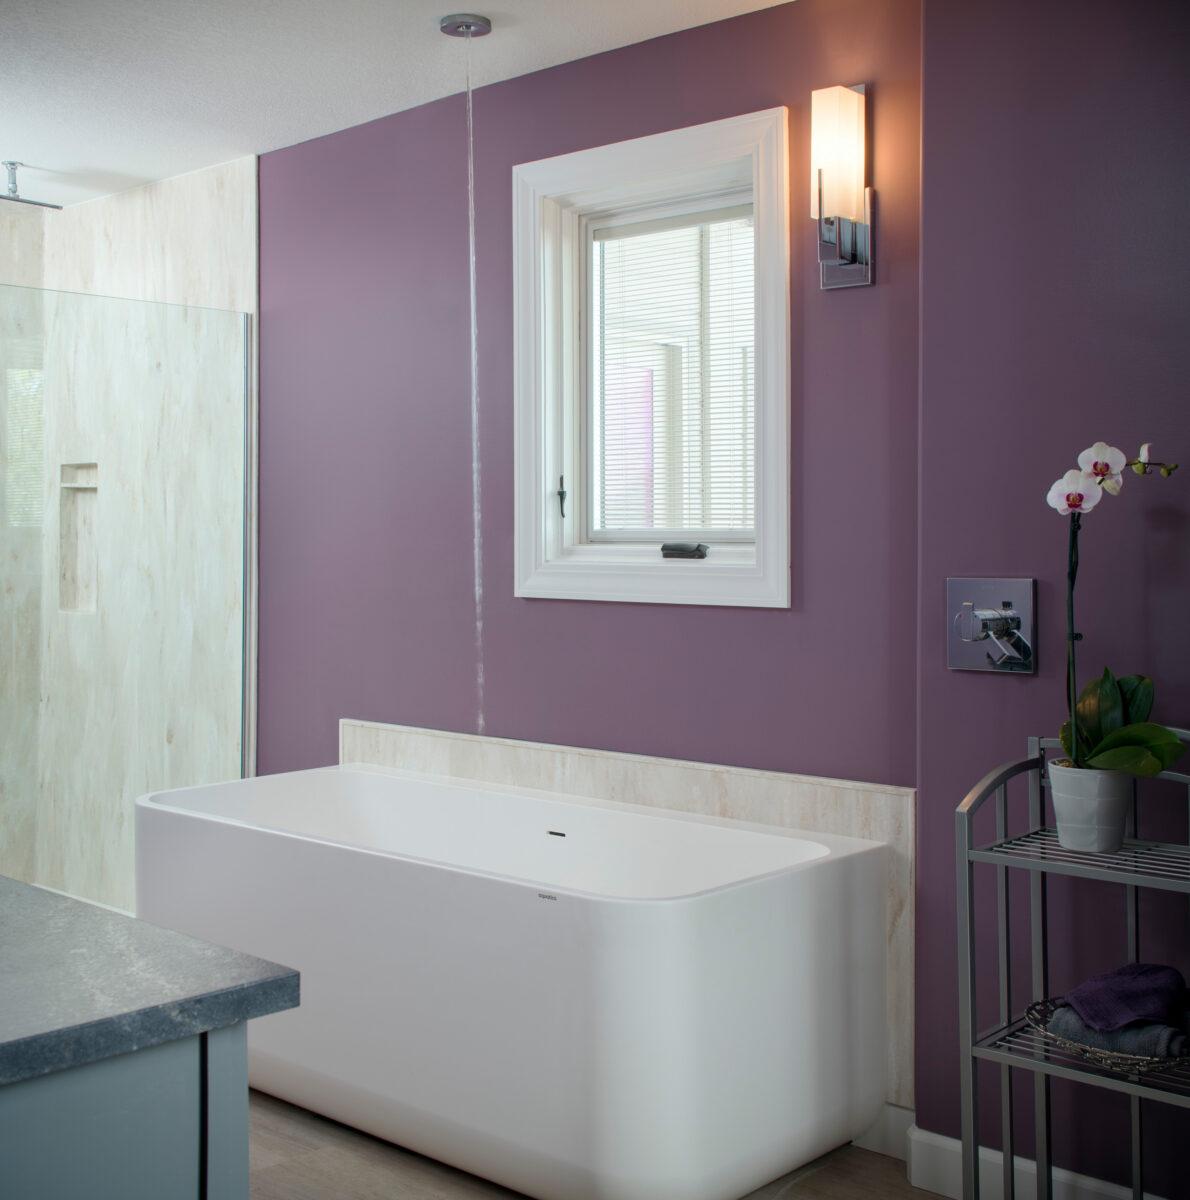 pareti-lavanda-bagno-contemporaneo